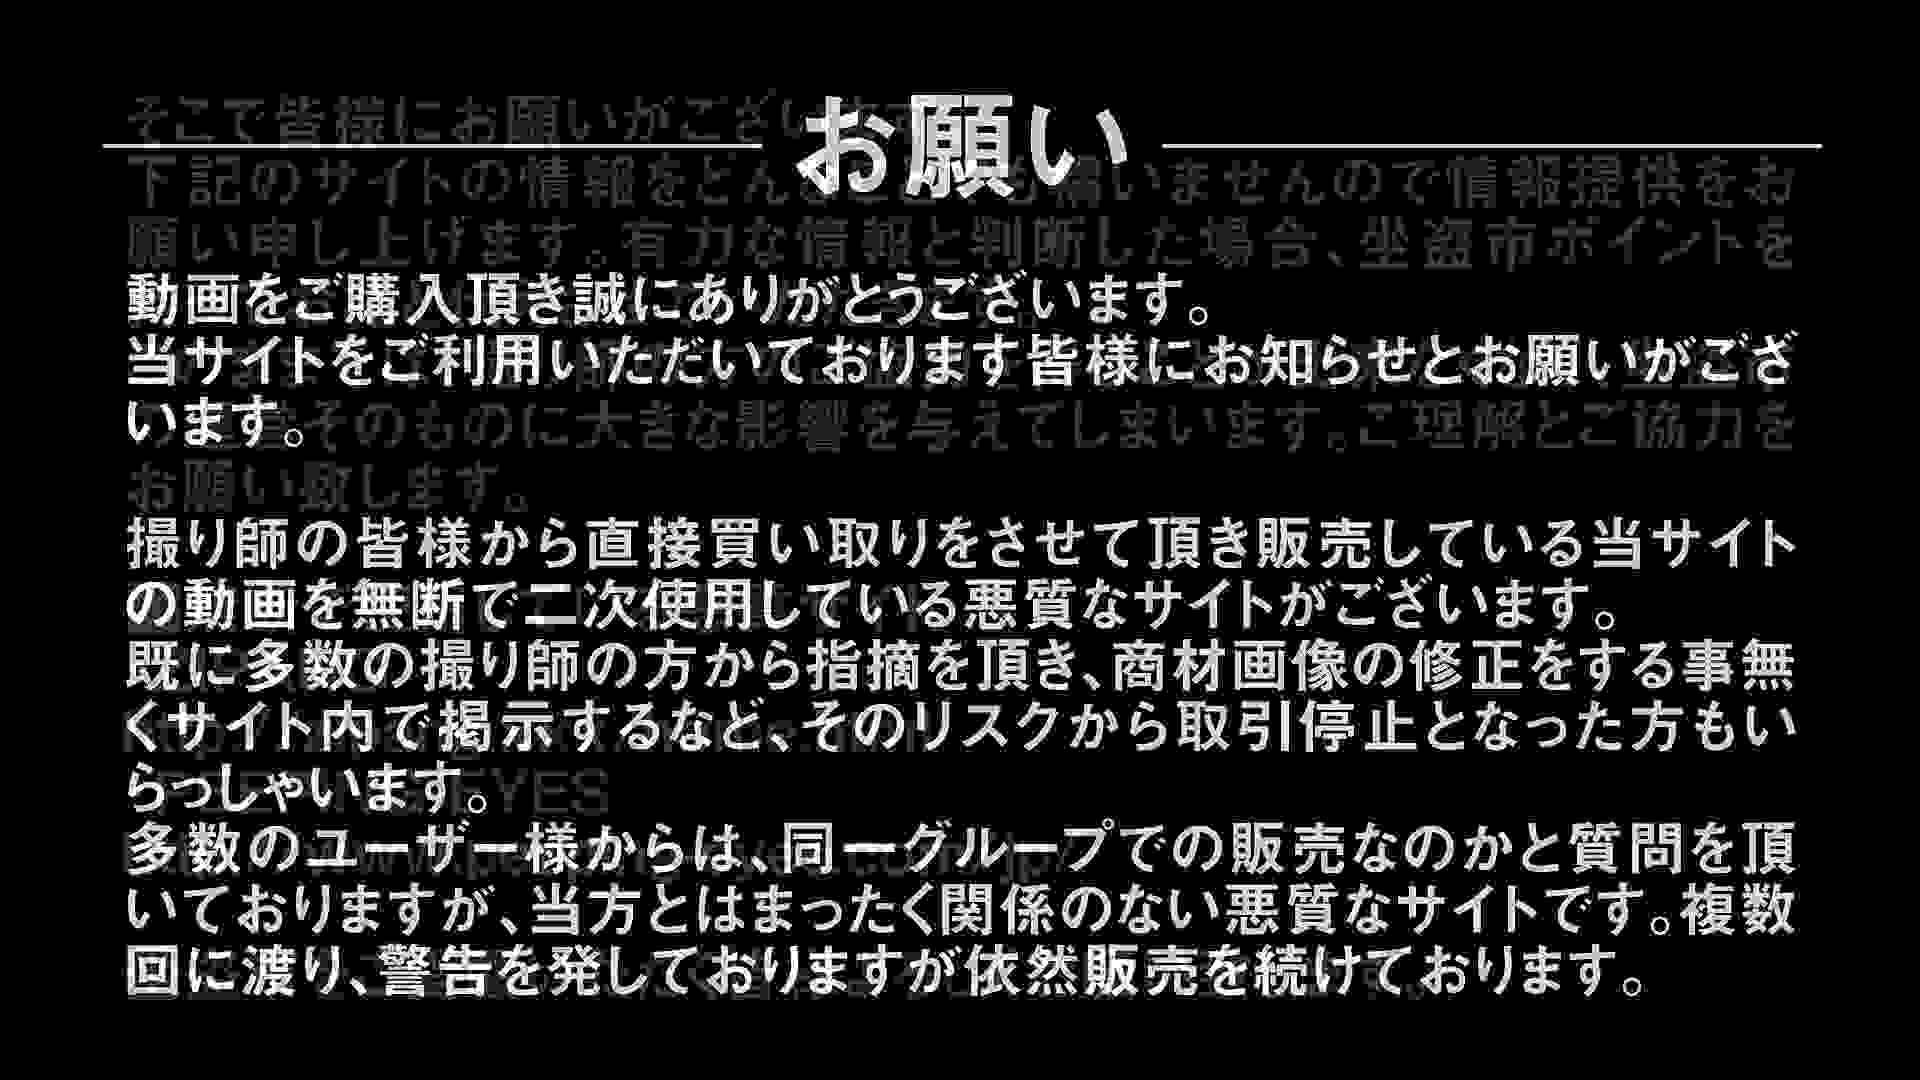 Aquaな露天風呂Vol.301 OLのエロ生活 すけべAV動画紹介 112連発 29